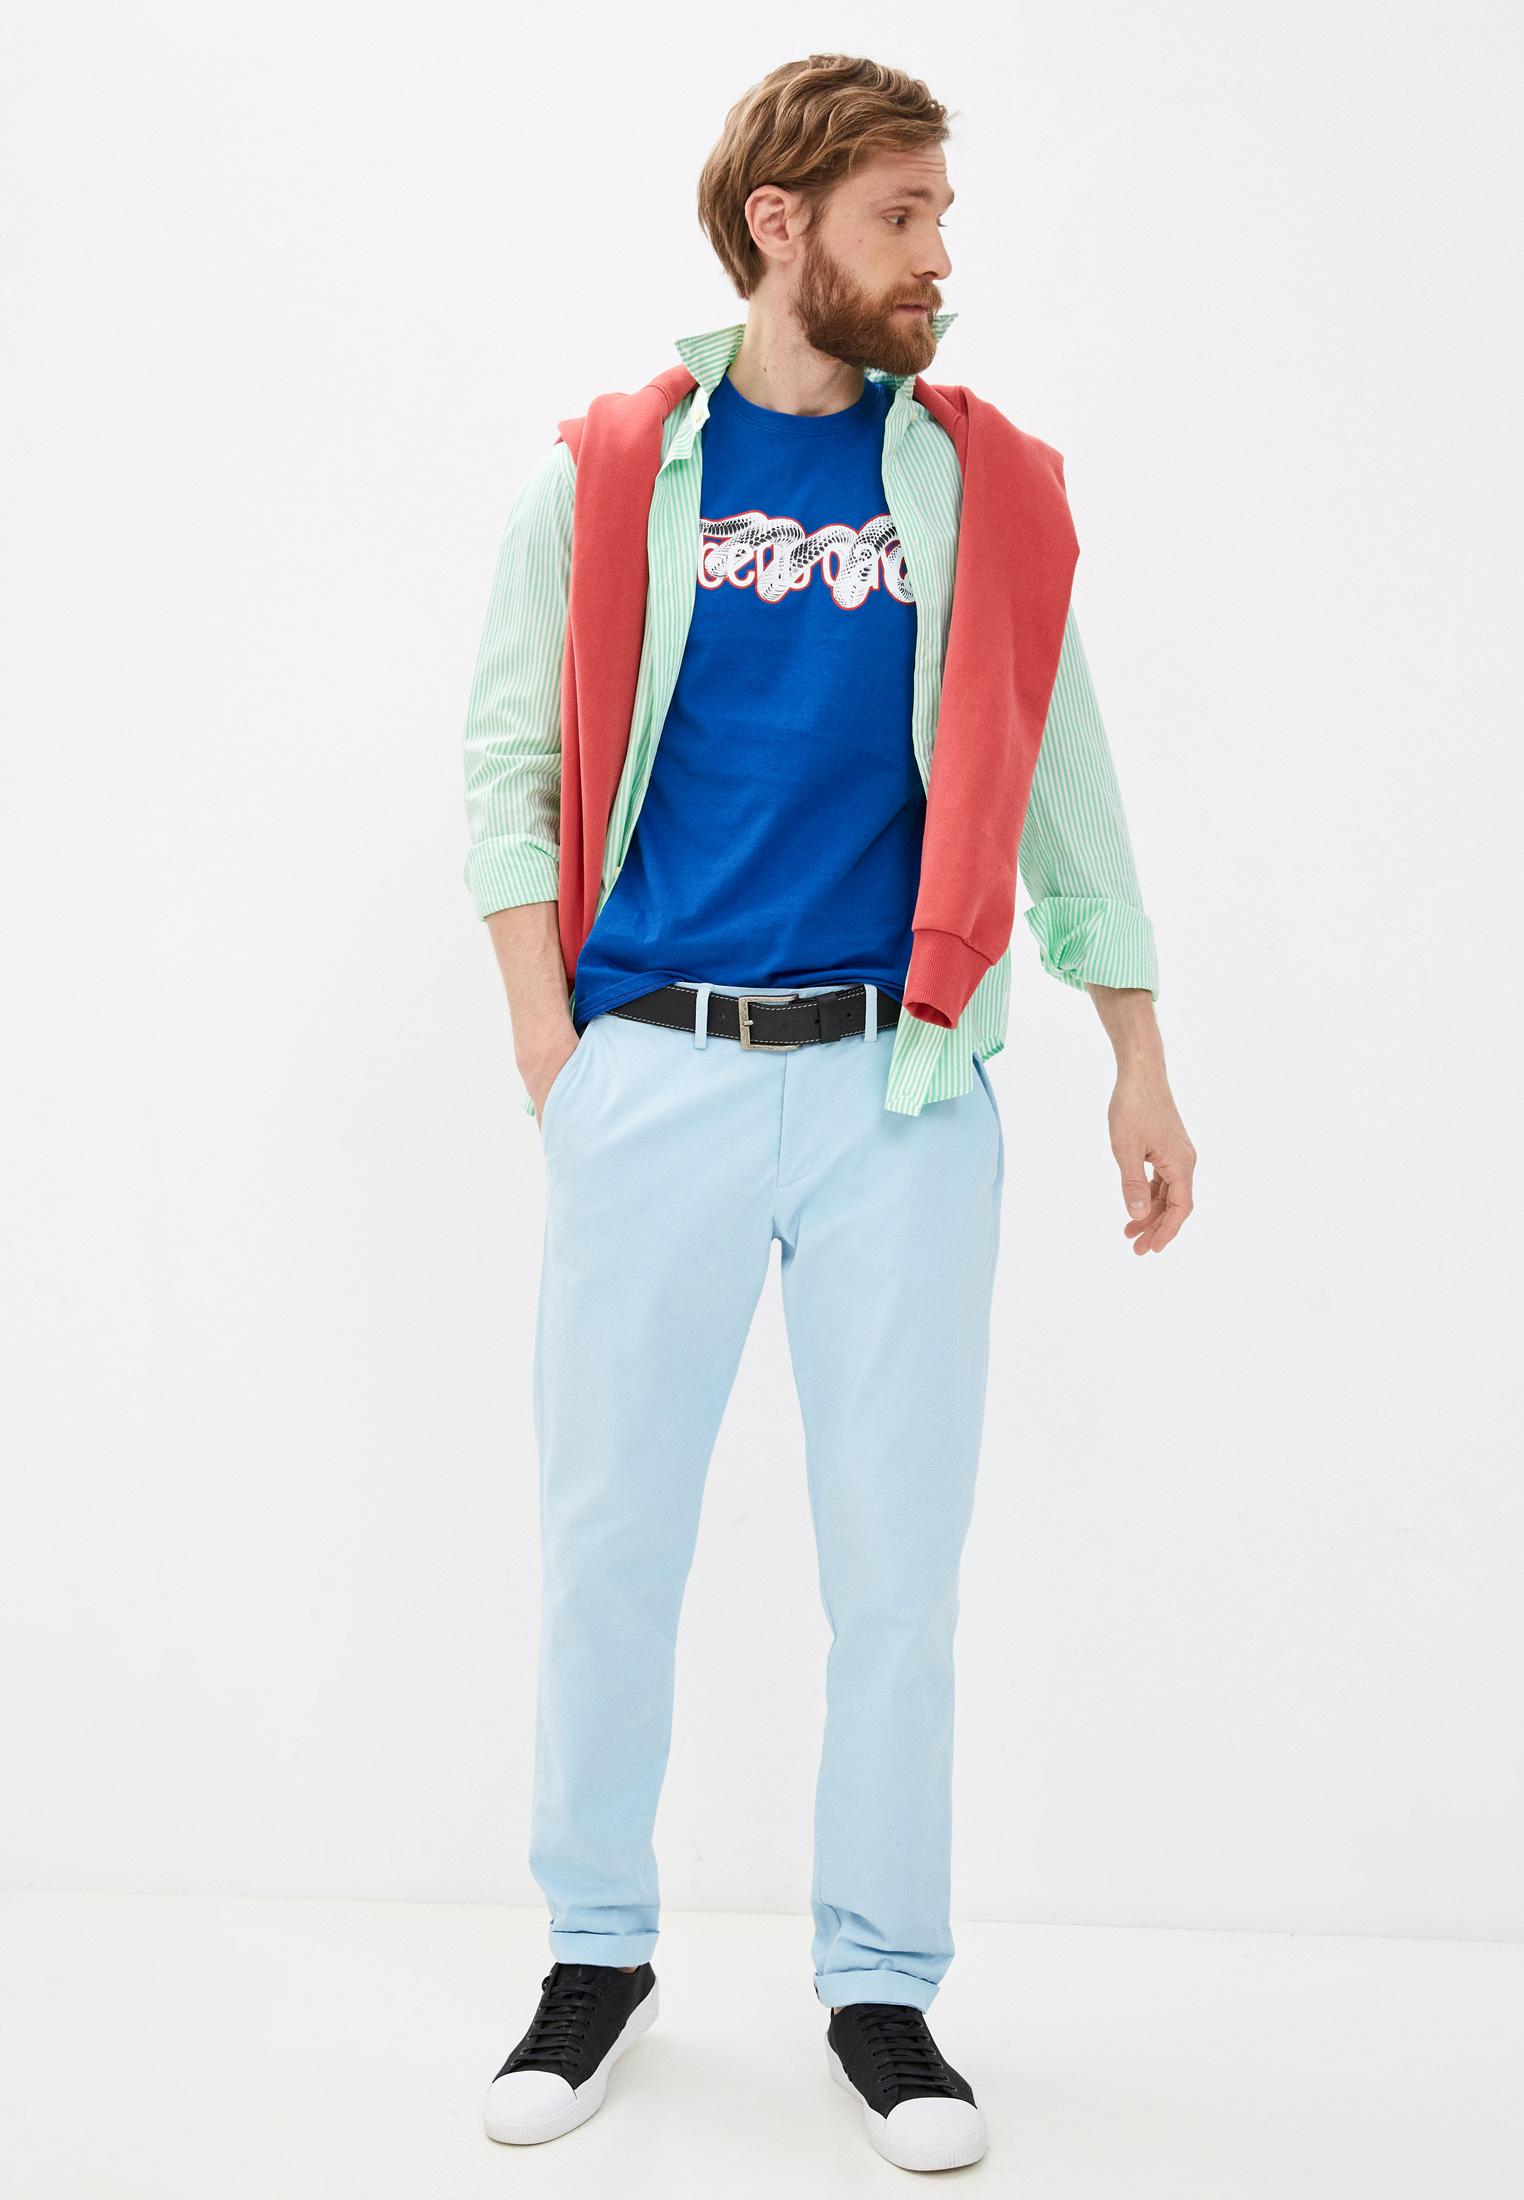 Мужская футболка Roberto Cavalli (Роберто Кавалли) GST655A027: изображение 3